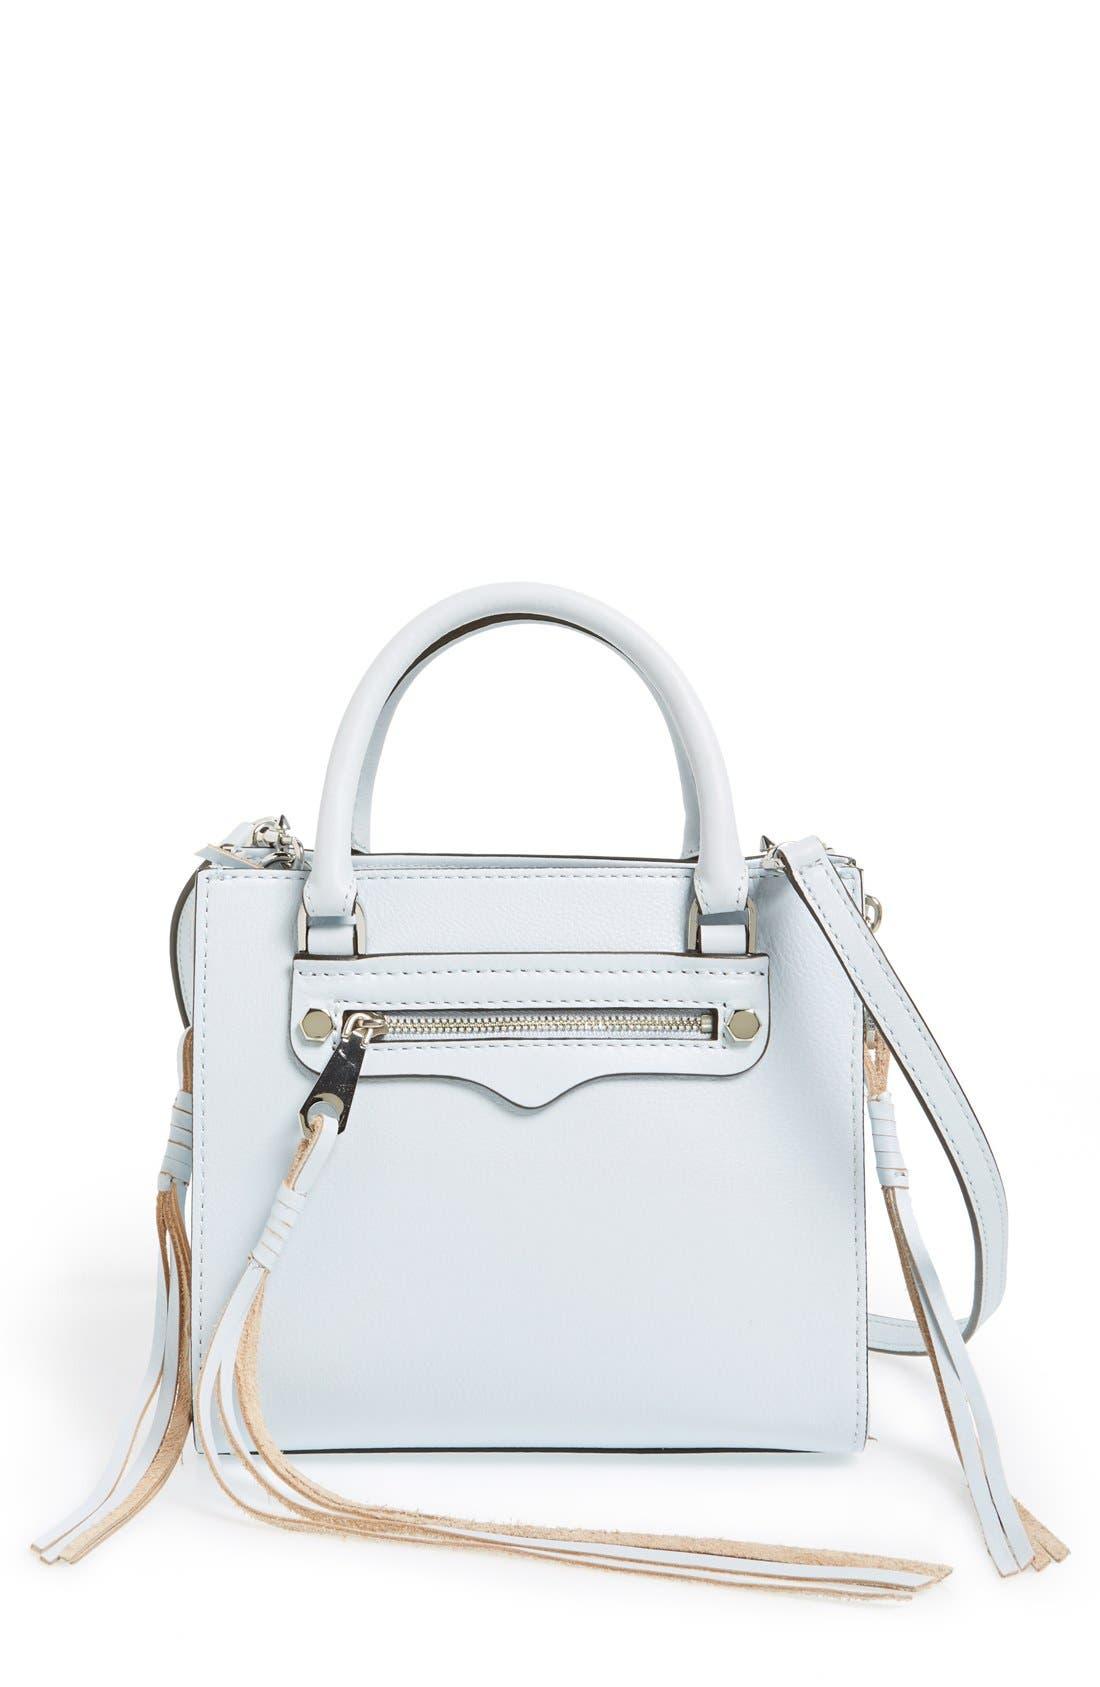 Alternate Image 1 Selected - Rebecca Minkoff 'Side Zip Mini Regan' Crossbody Bag (Nordstrom Exclusive)